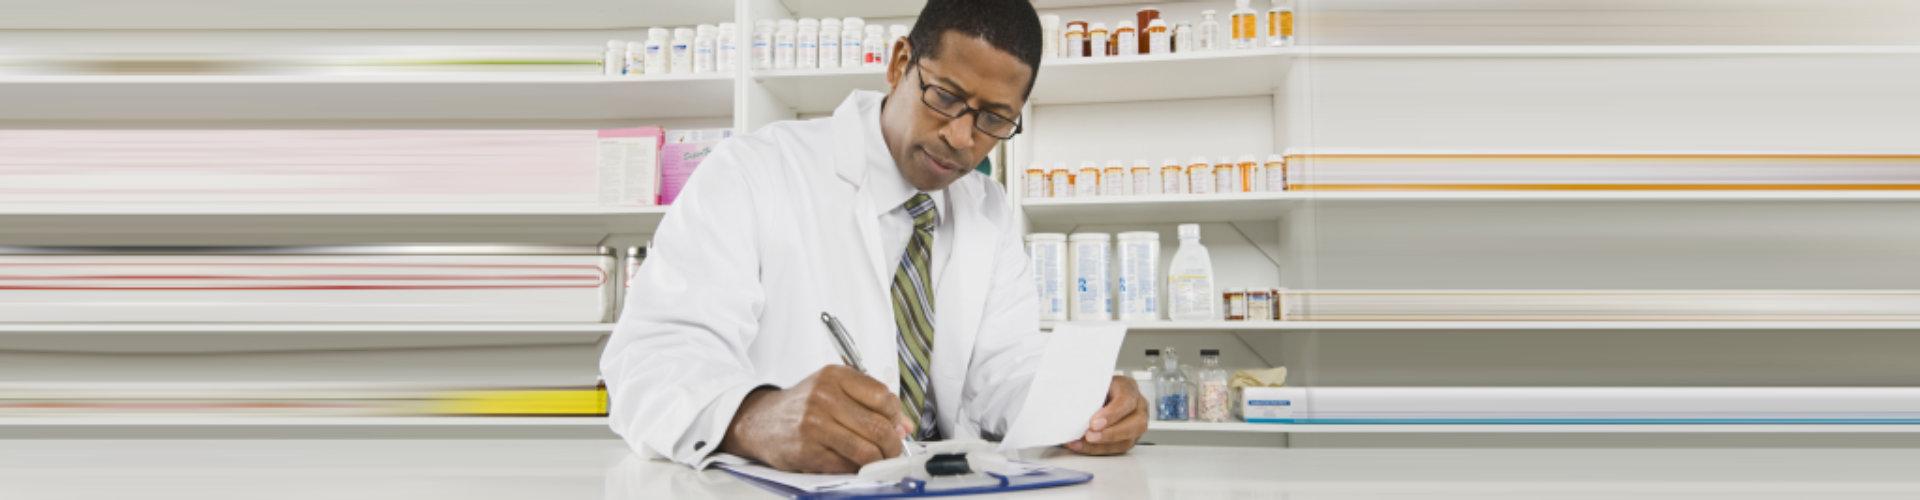 male pharmacist smiling